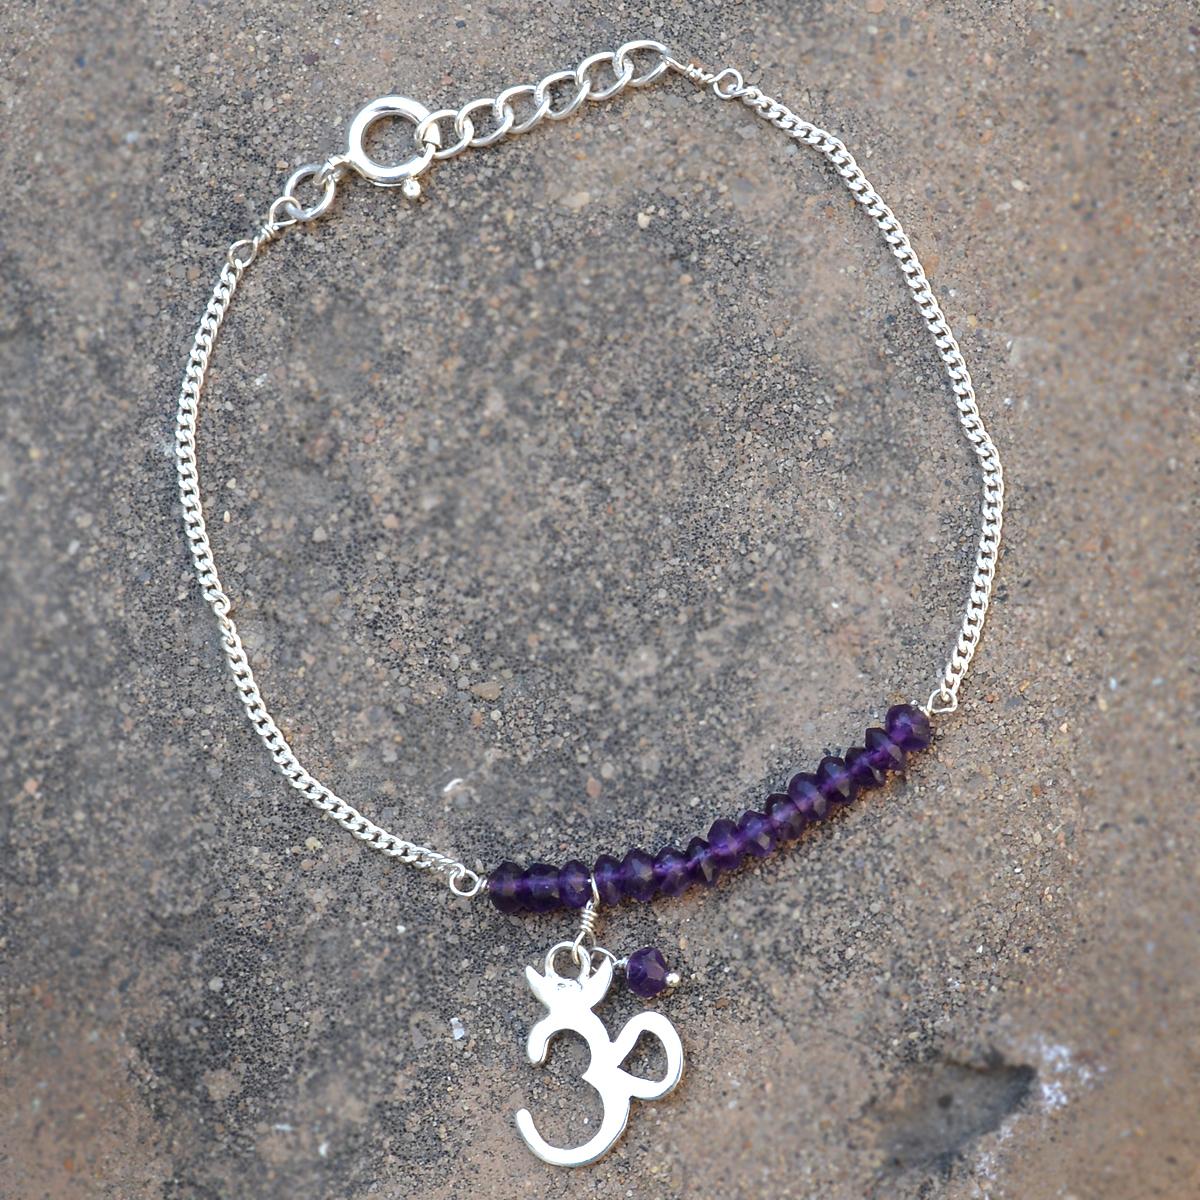 Amethyst Gemstone Silver Bracelet PG-155895